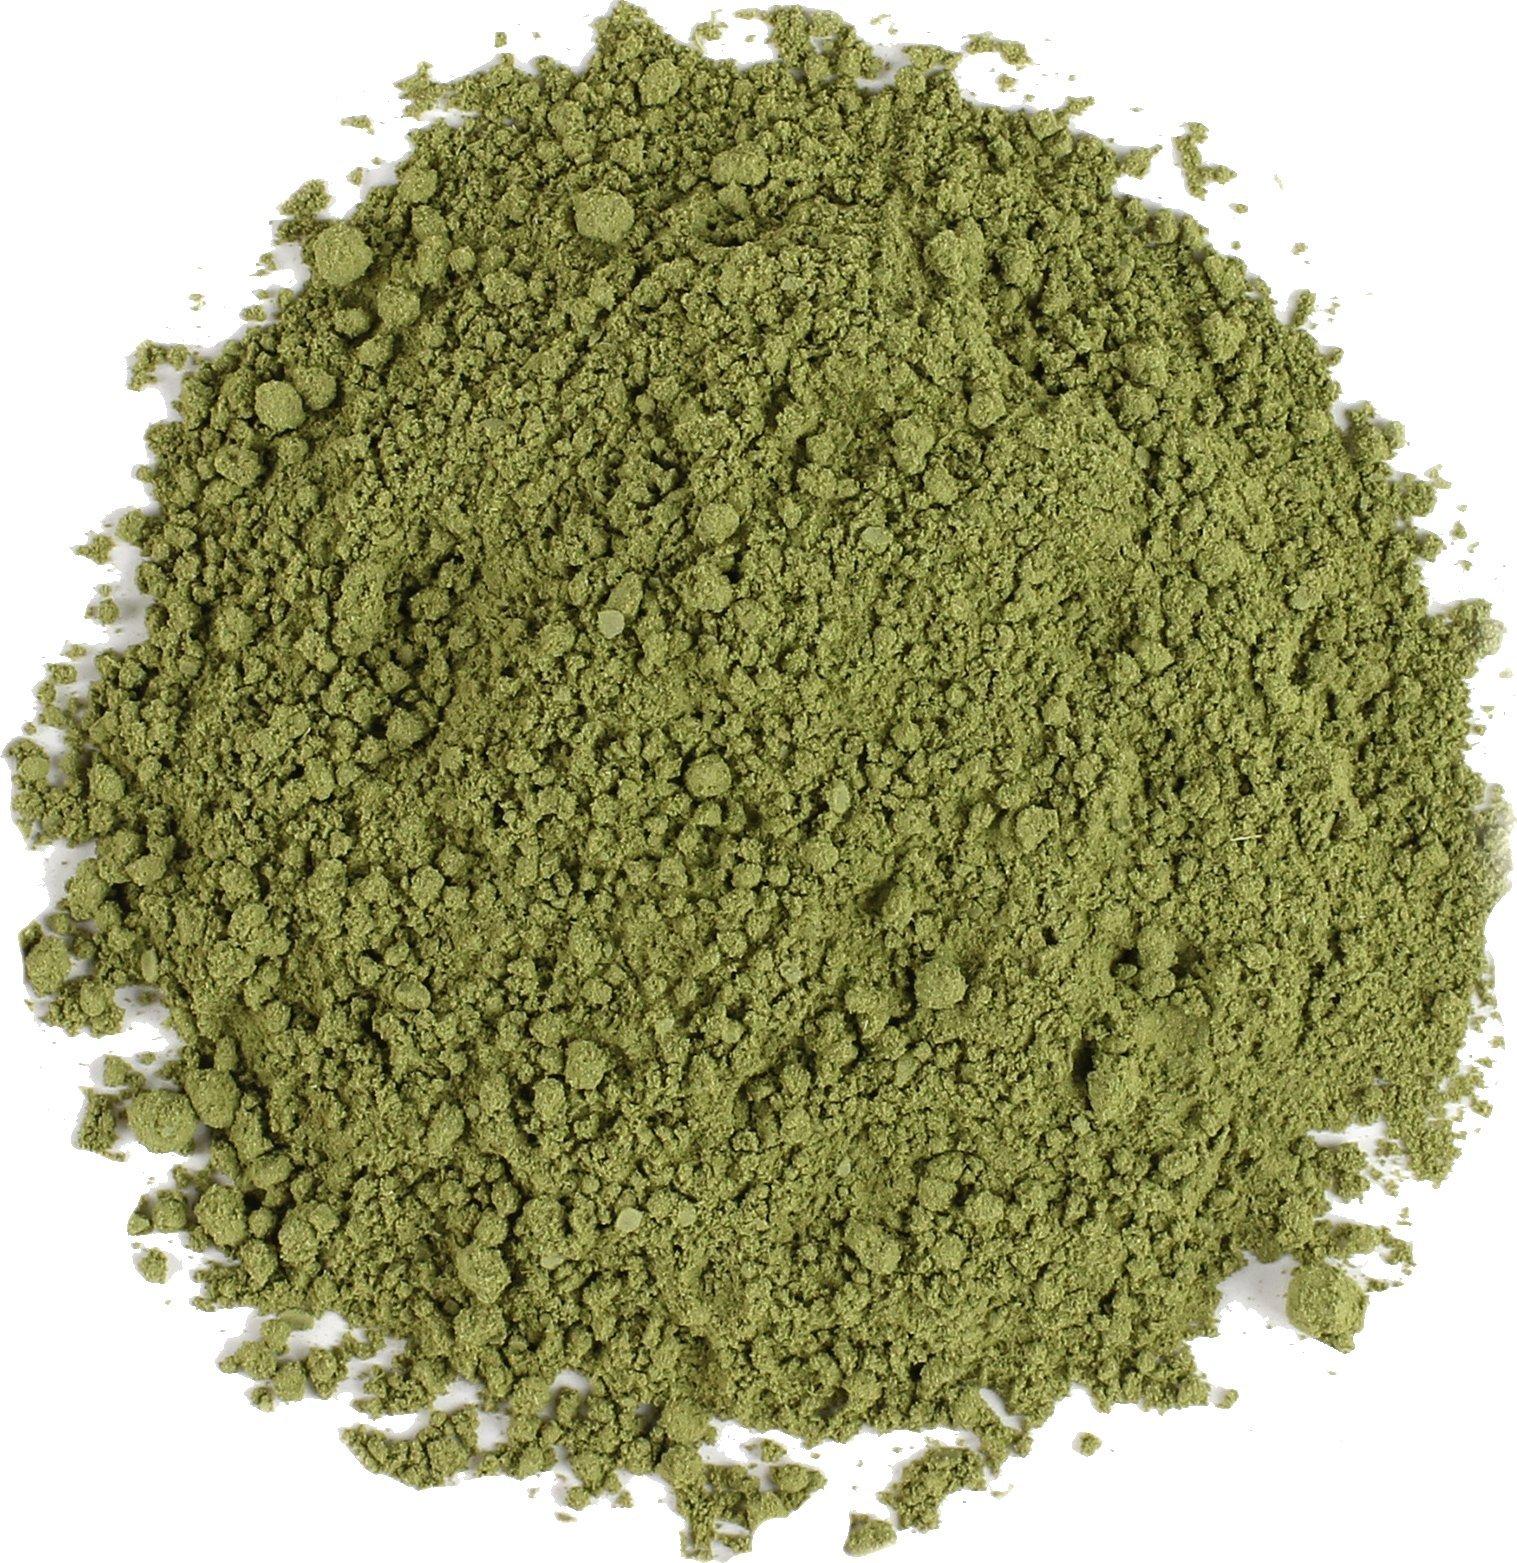 Frontier Co-op Matcha Green Tea Powder Certified Organic, 16 Ounce